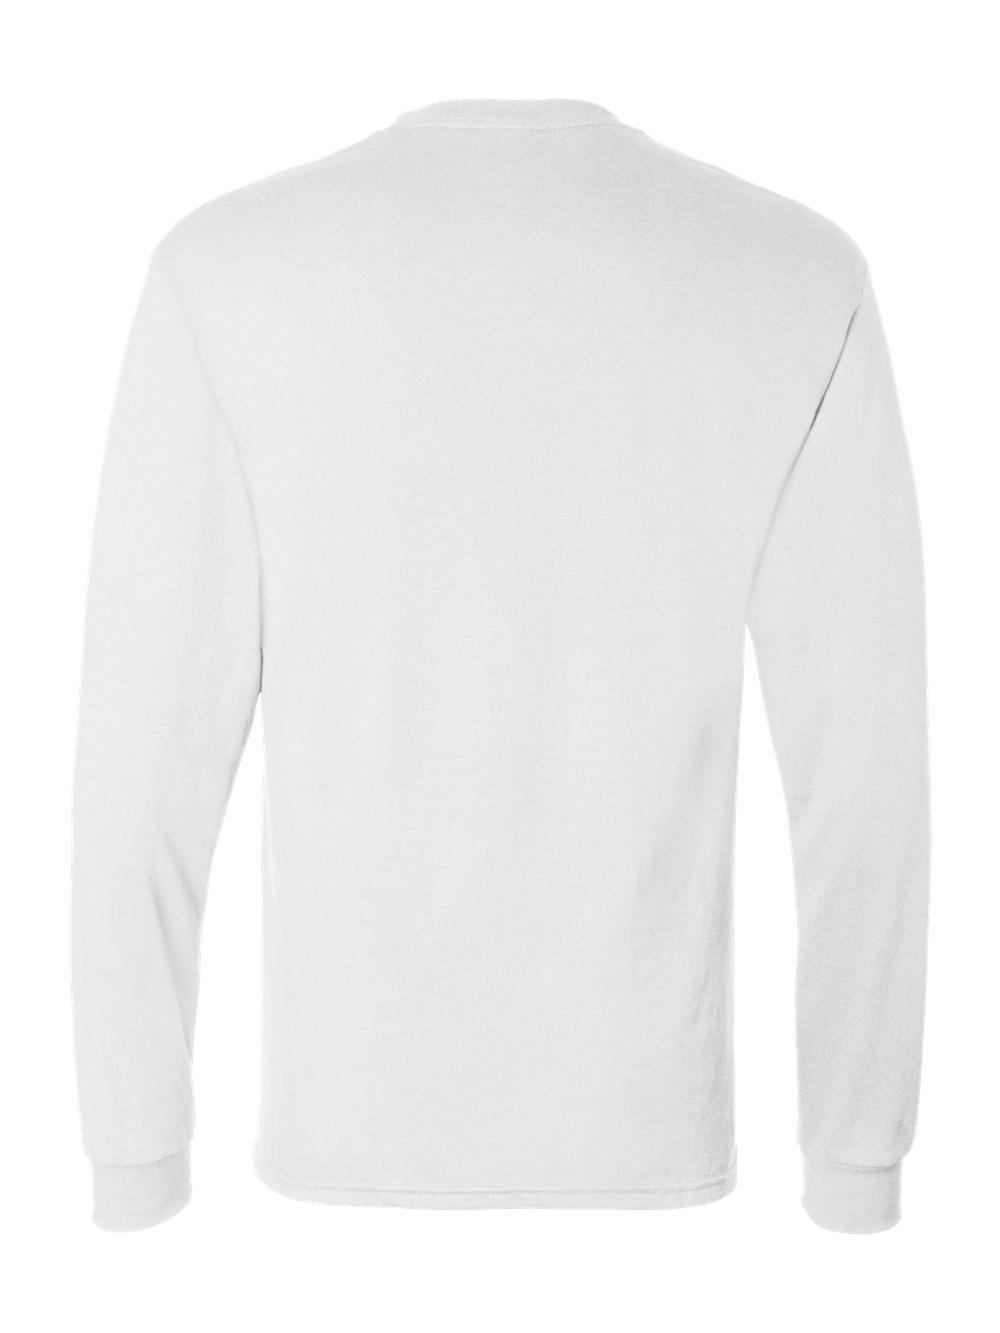 Hanes 5286 ComfortSoft Long Sleeve T-Shirt